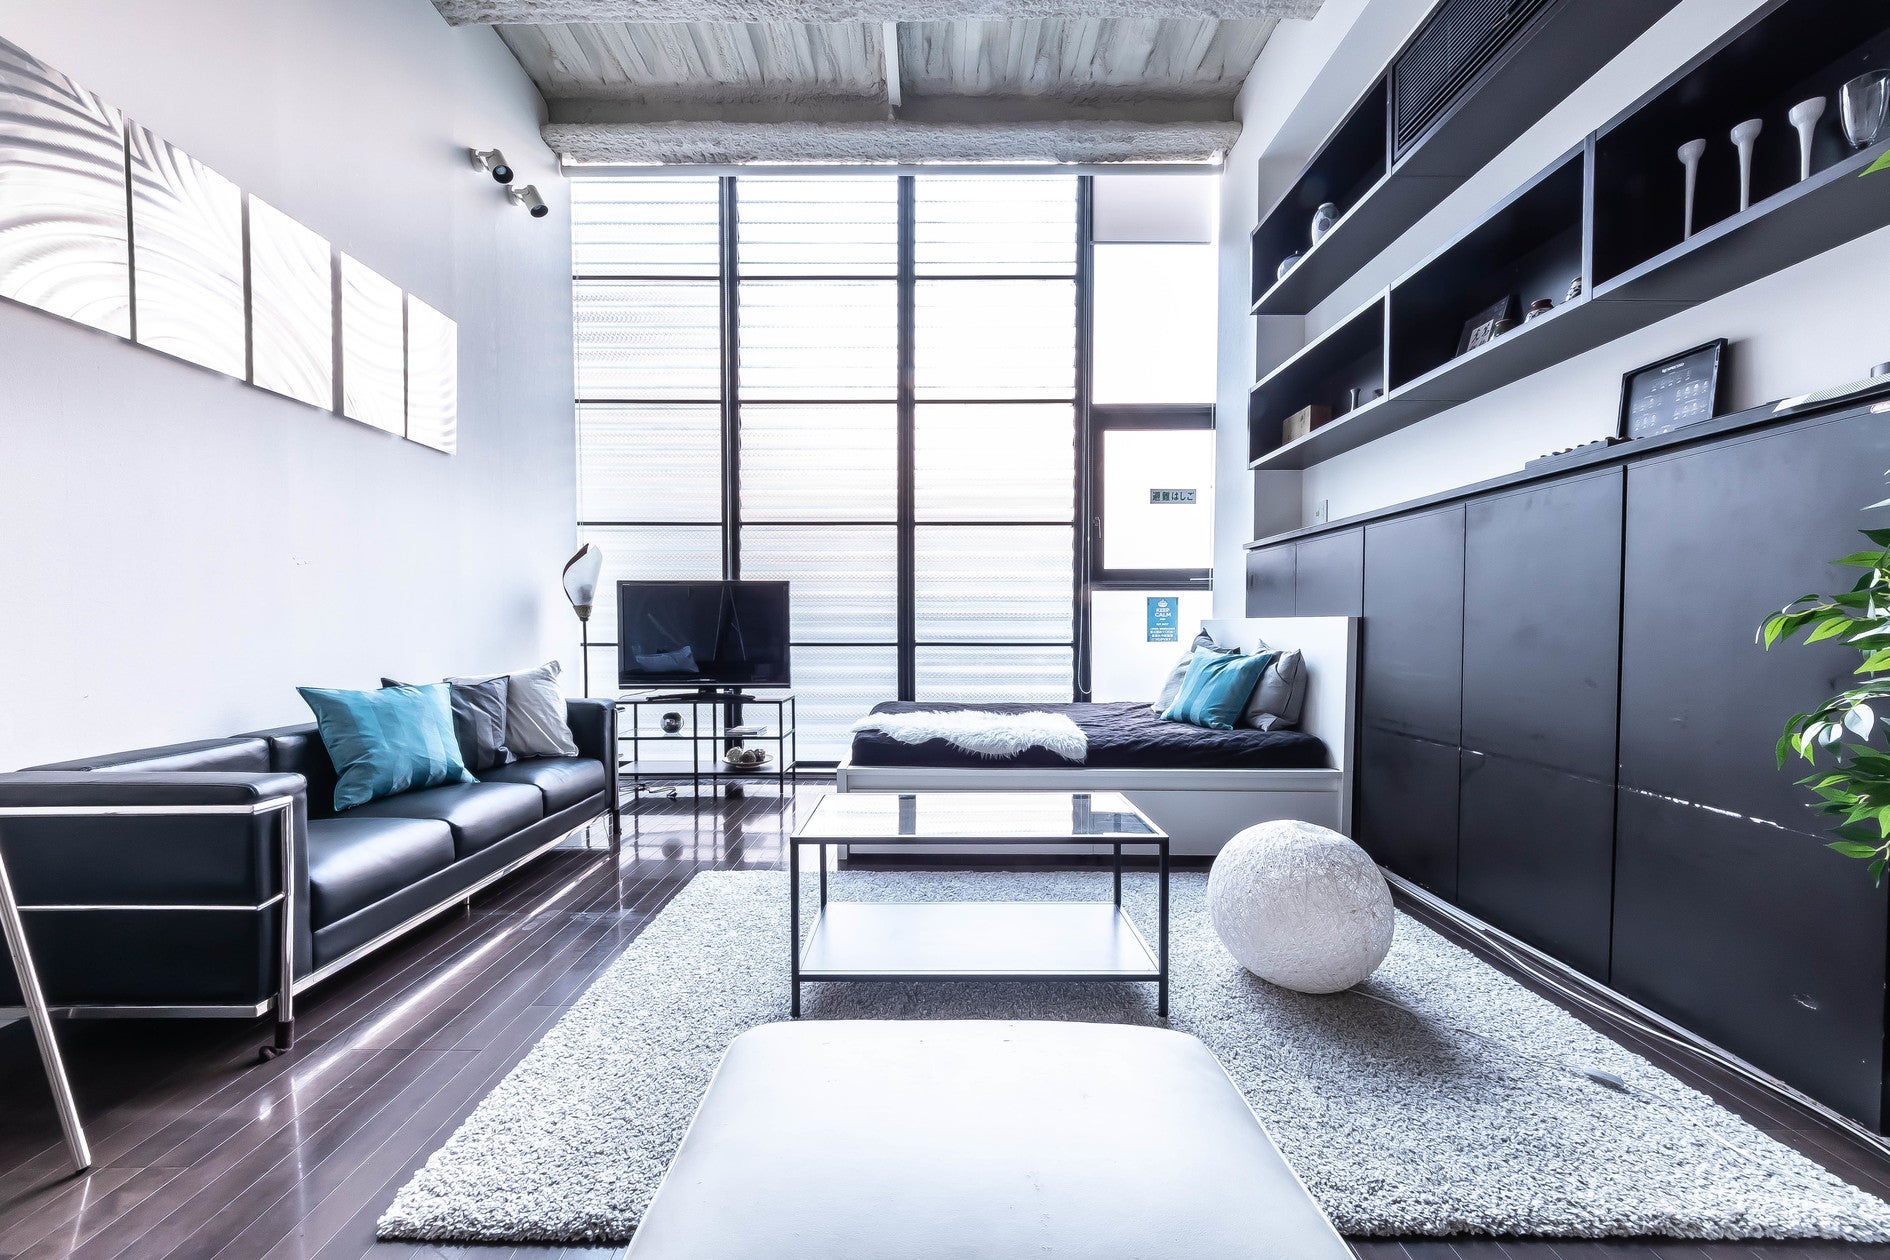 A3.デザイナーズ設計のキッチン付撮影スタジオ TV・雑誌の撮影多数、大人パーティにも最適!